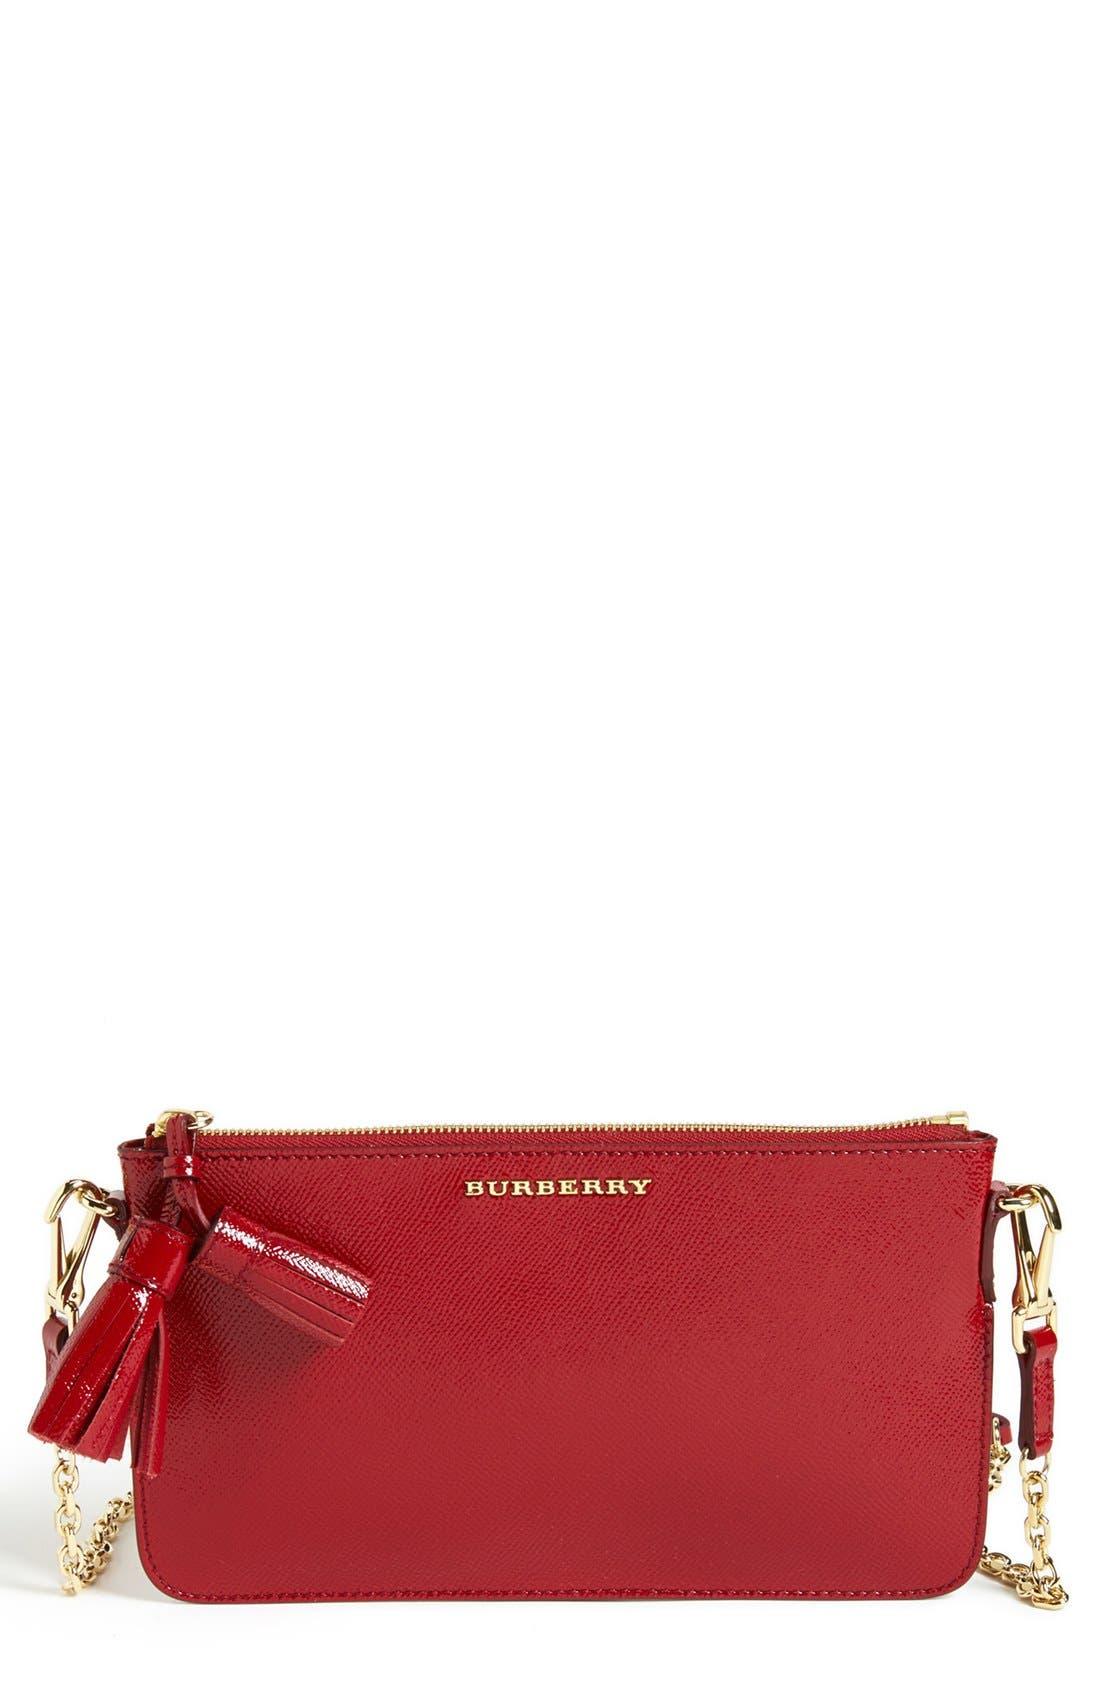 Alternate Image 1 Selected - Burberry 'Peyton' Crossbody Bag